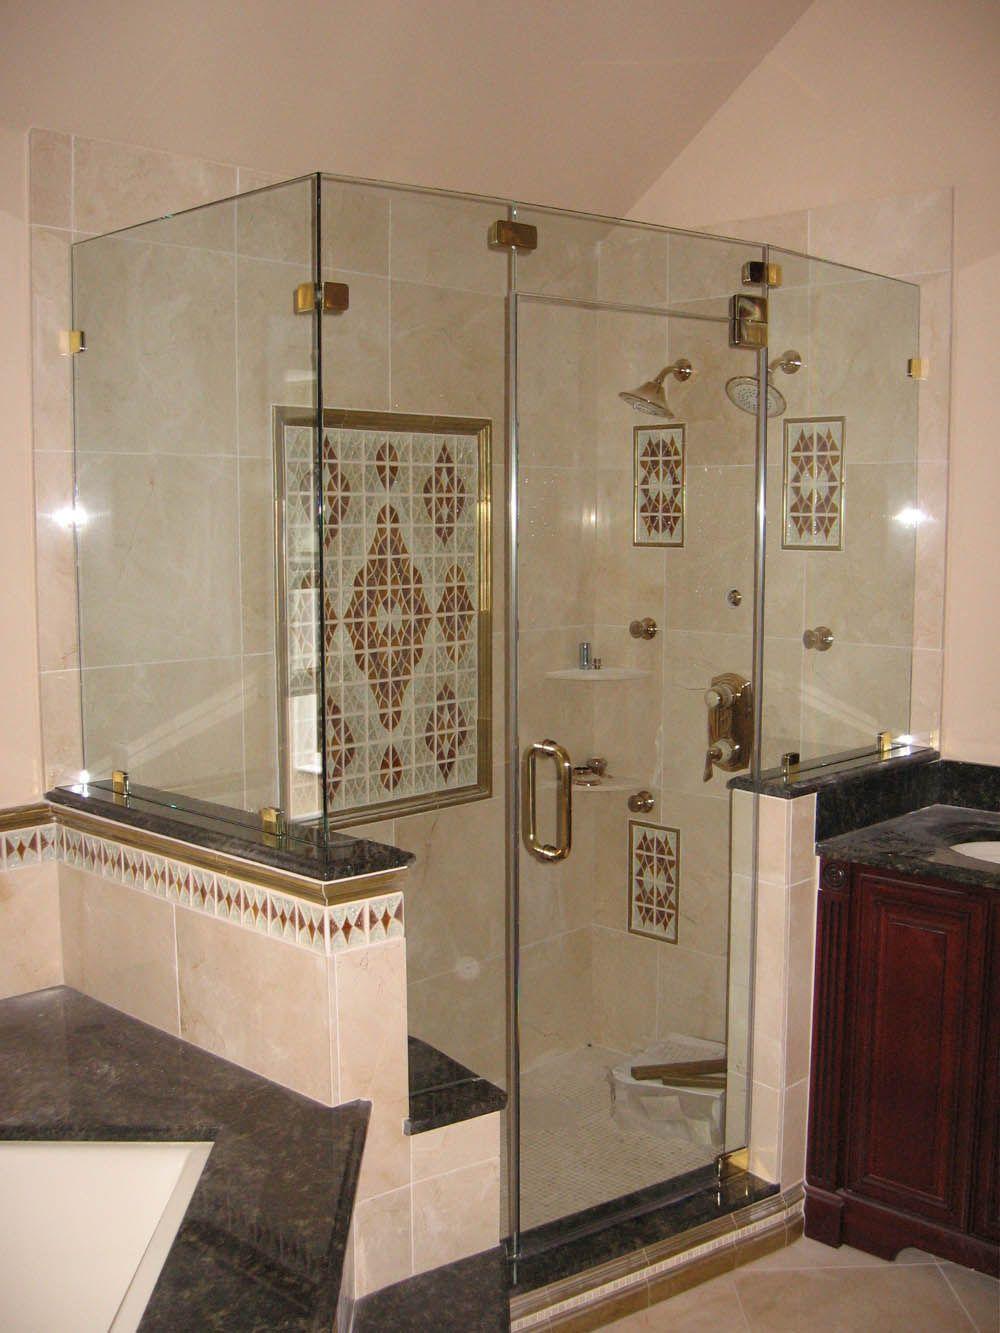 Calming Soft Brown Loft Bathroom Focused On Corner Glass Shower Room ...